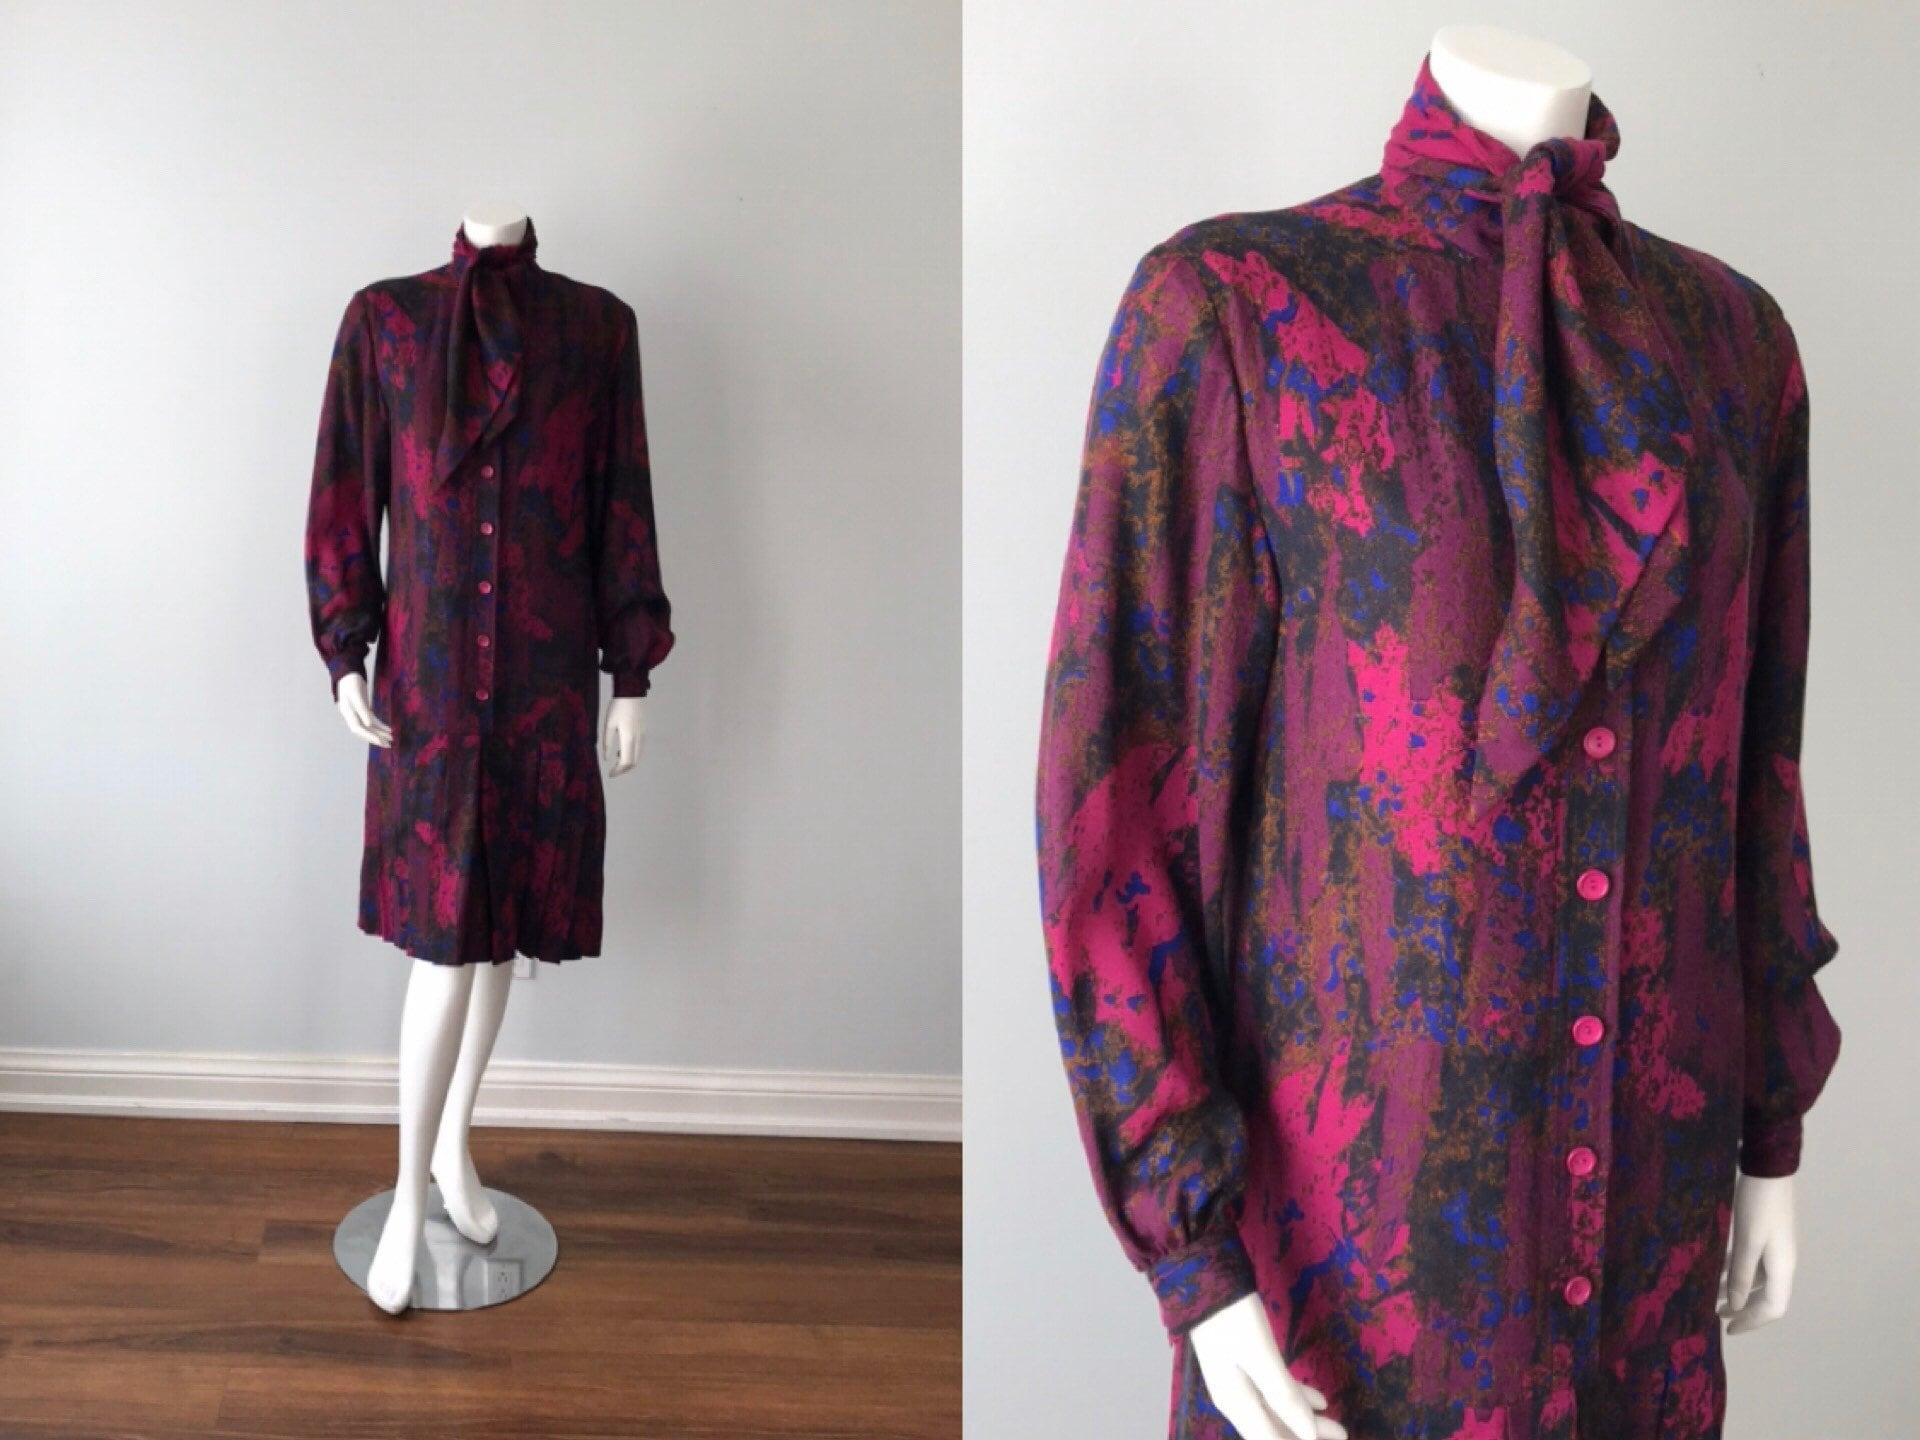 80s Dresses | Casual to Party Dresses Jl Scherrer, Vintage Fall Dress, 1980S Scherrer Boutique, Silk Casual High Fashion Dress $95.00 AT vintagedancer.com